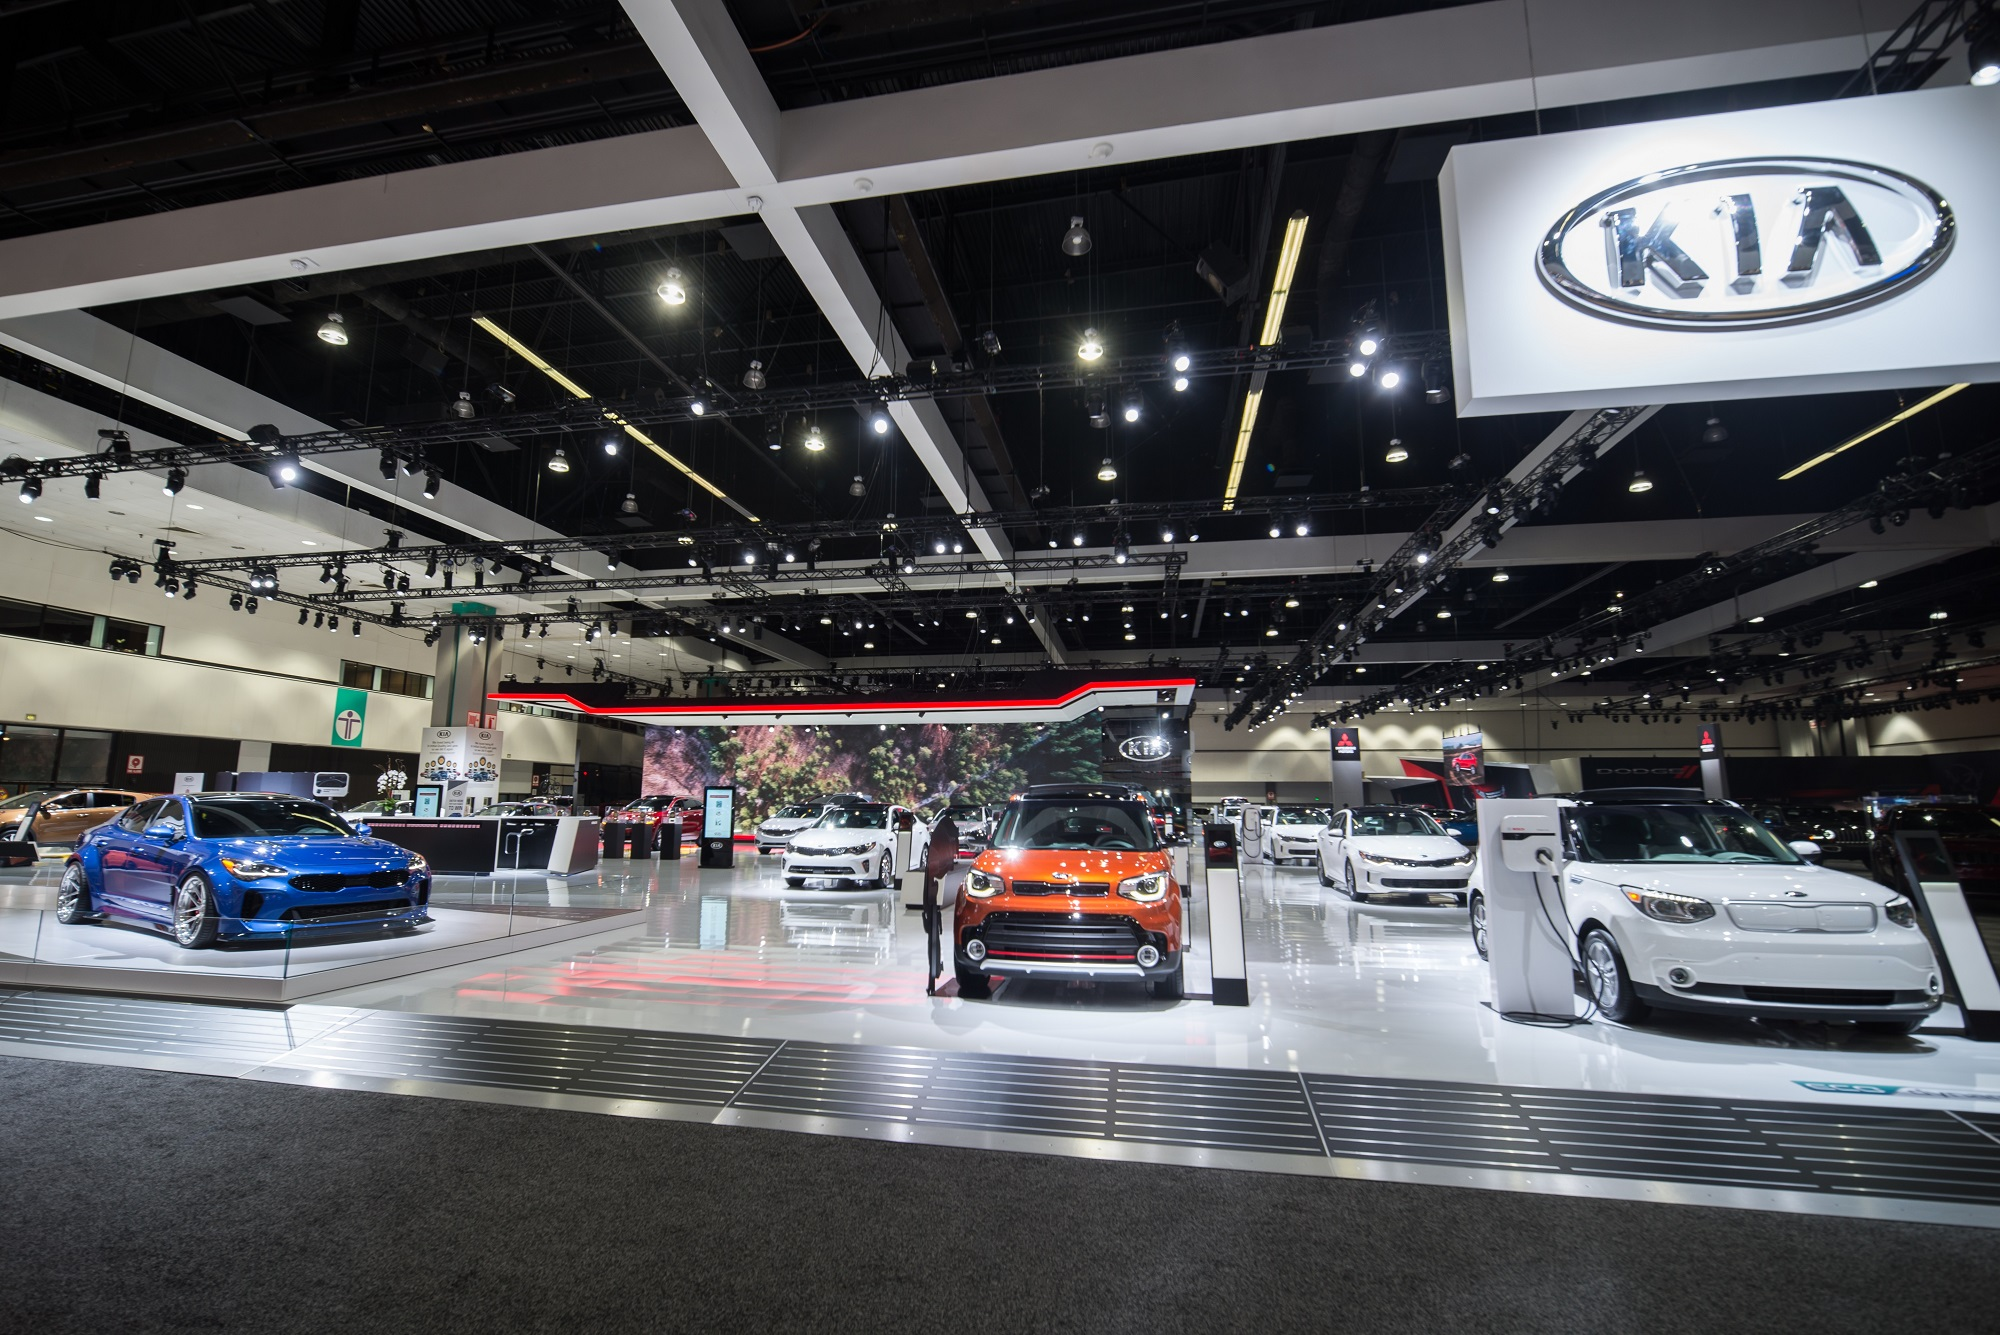 Elation Fuze Wash Highlights Kia Booth At LA Auto Show PLSN - Car show booth